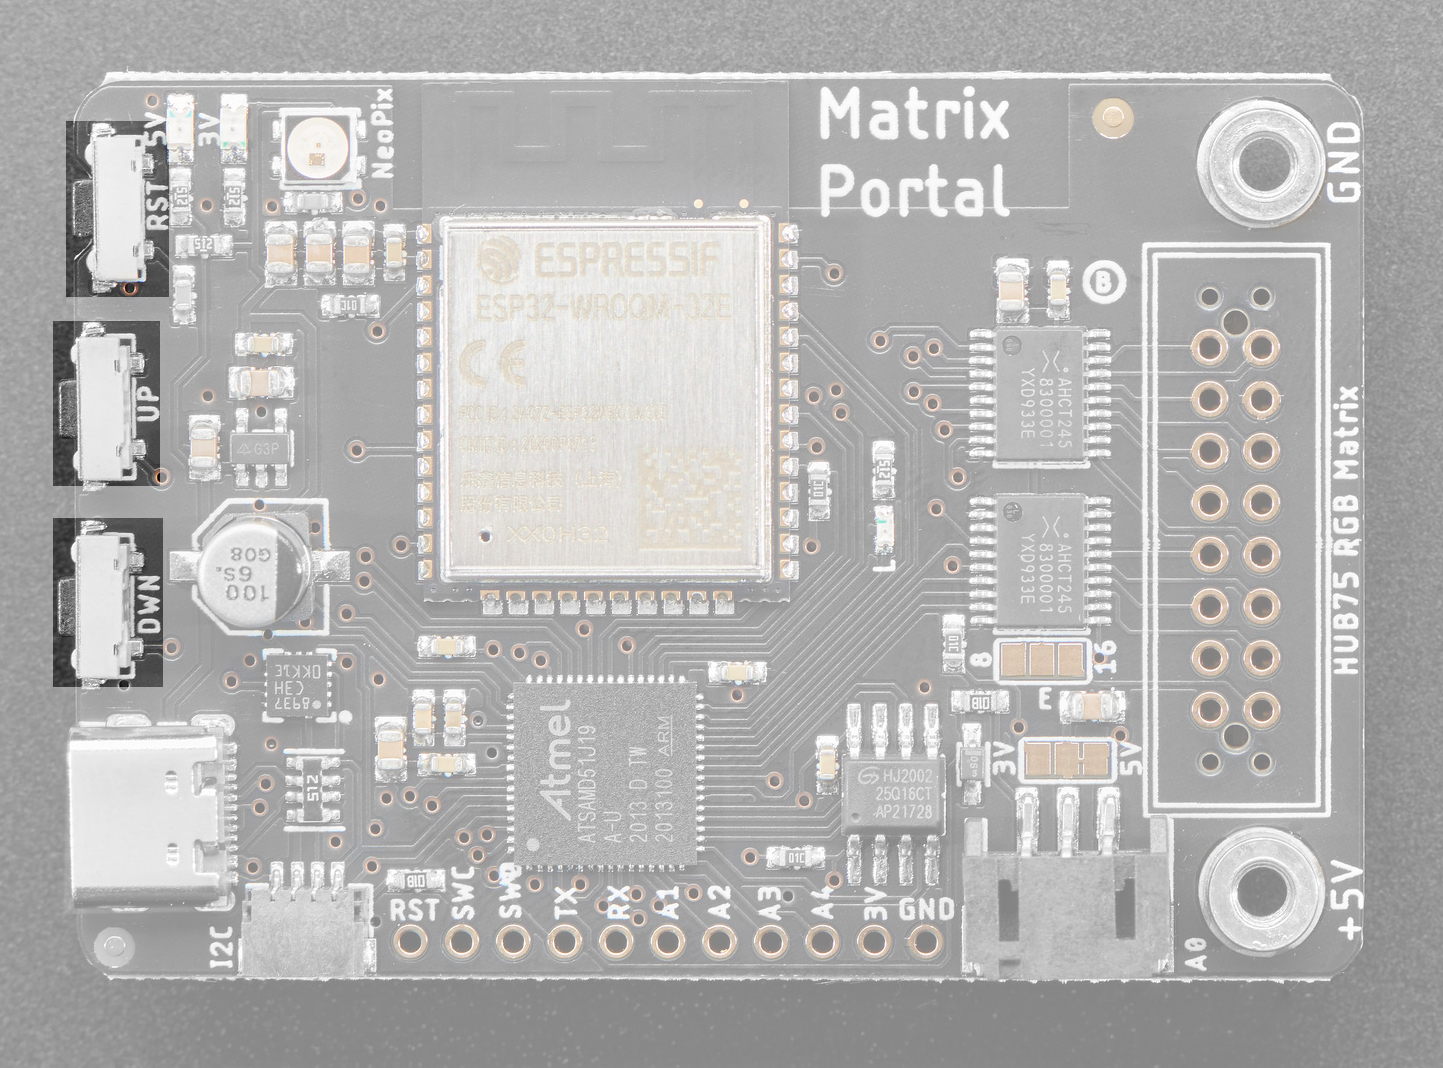 led_matrices_matrixportal_pinout_buttons.jpg